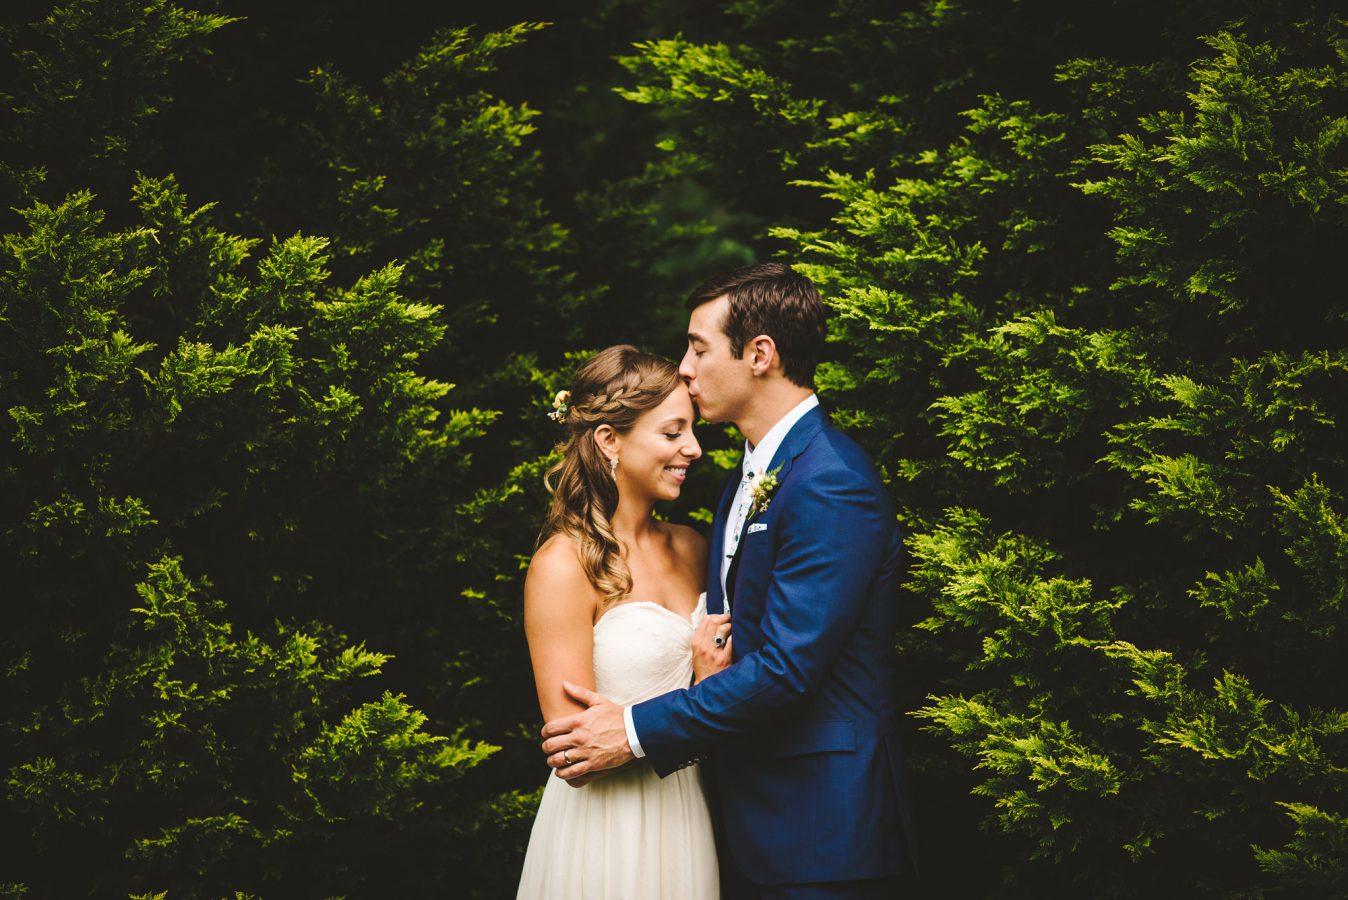 fete-photography-weddings-2017-014